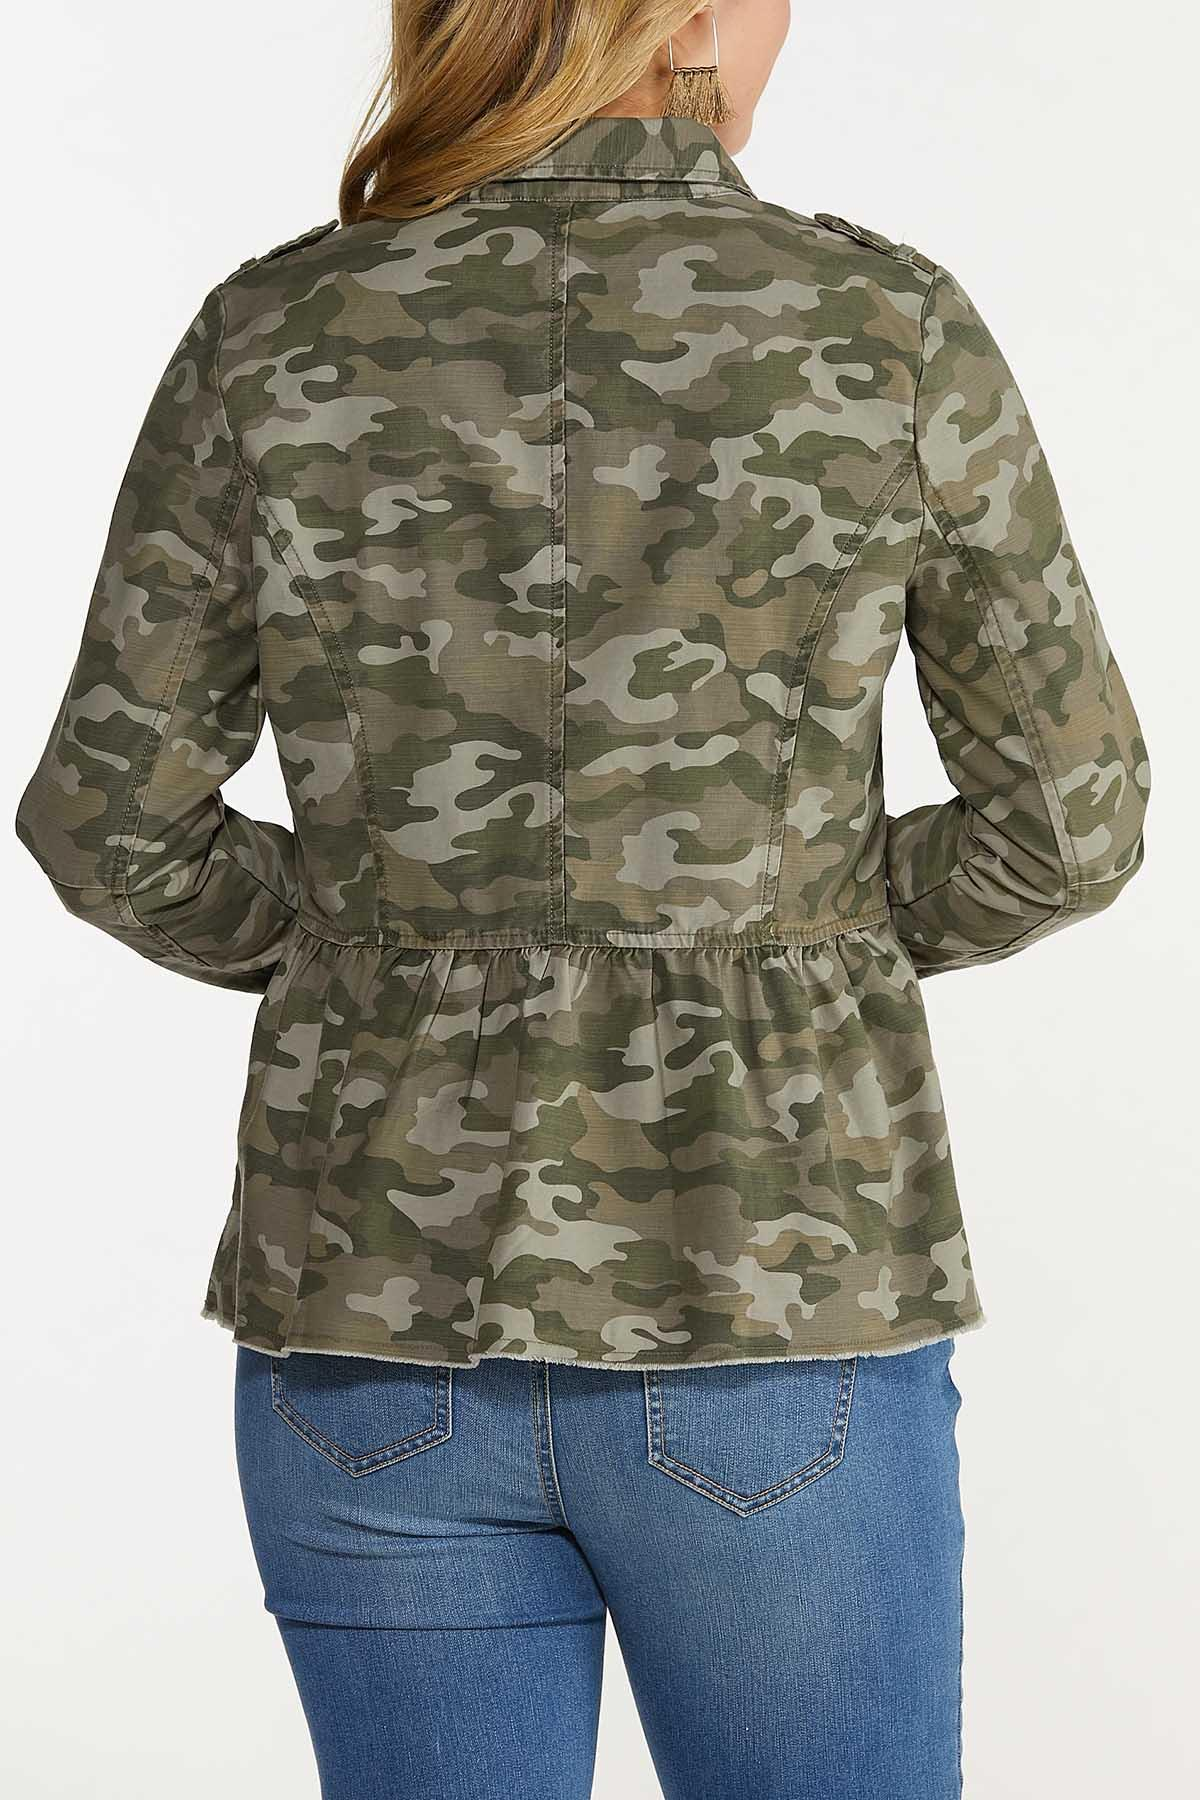 Camo Peplum Jacket (Item #44642729)